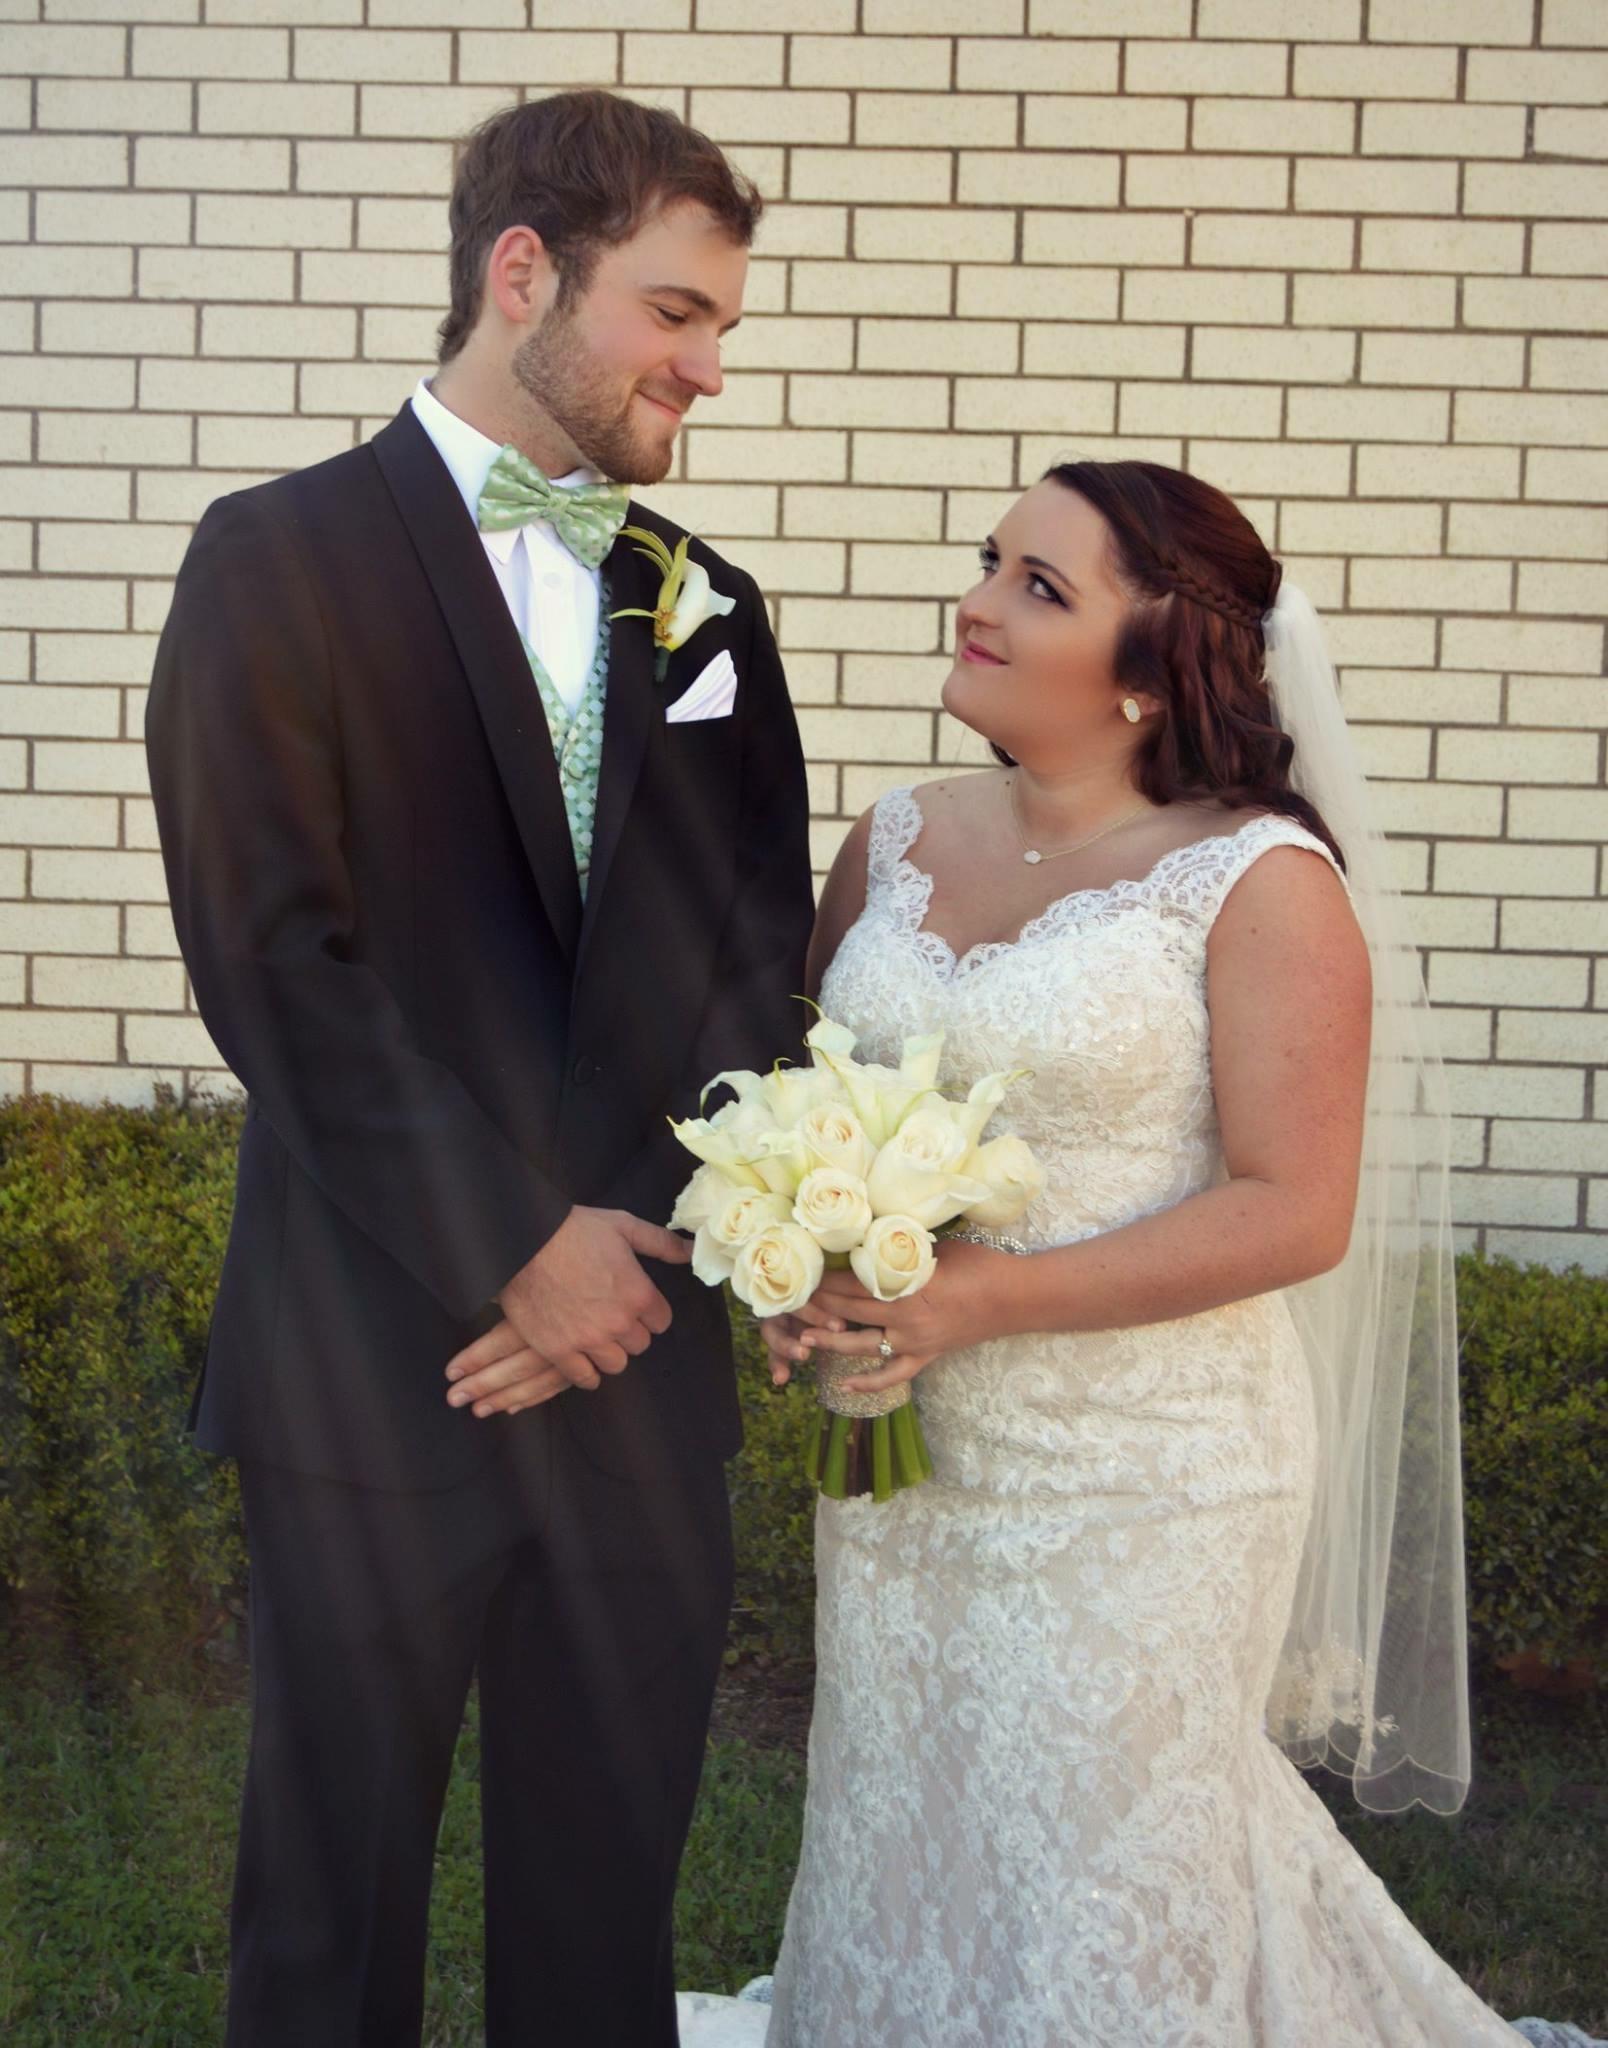 Katie & Byron | Denison, TX Wedding